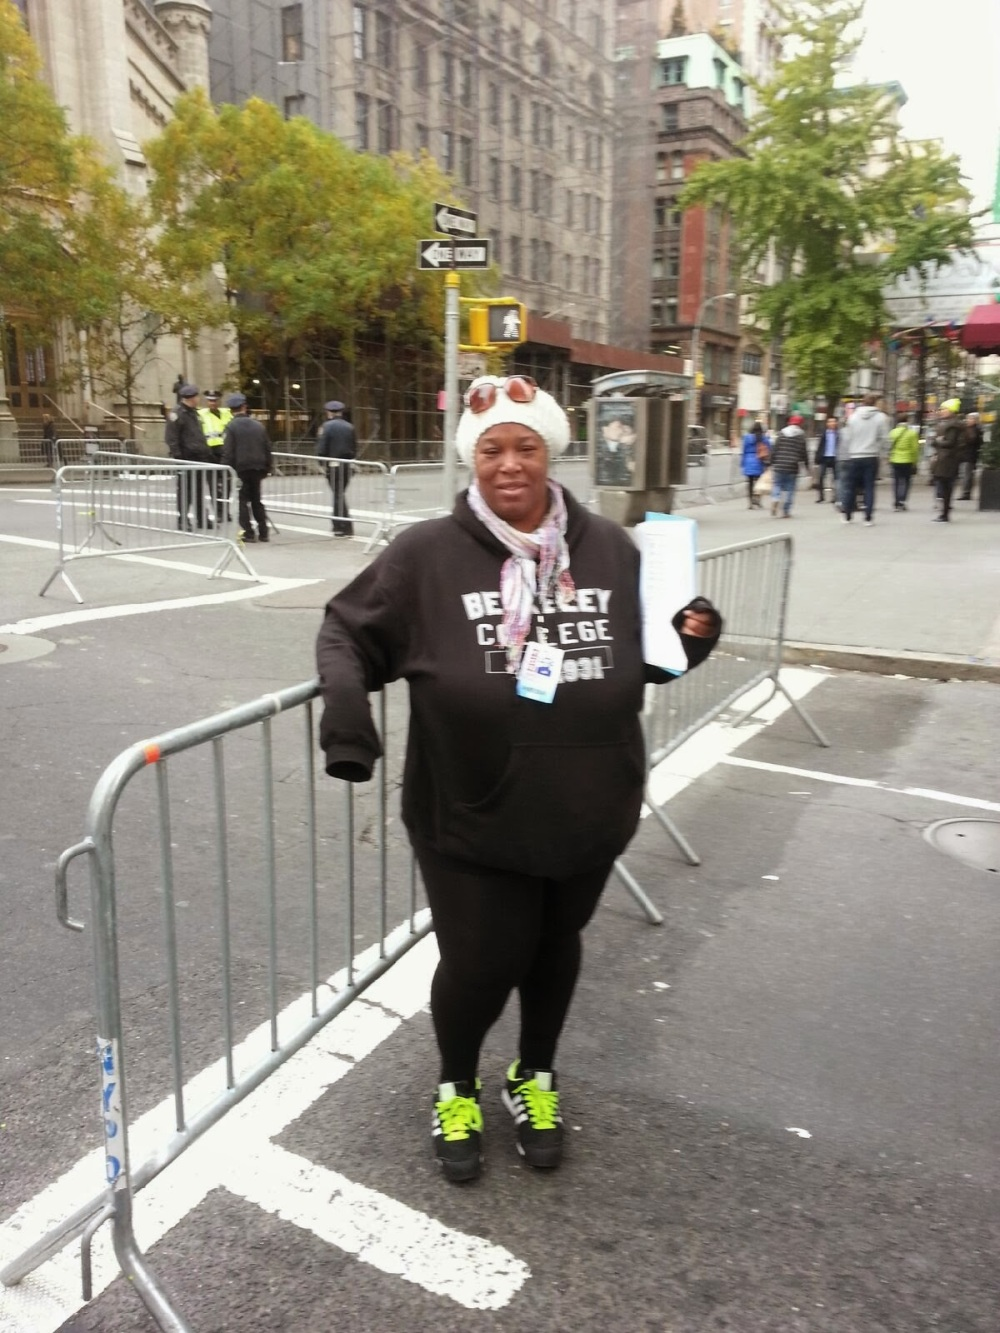 Sharla Hanley at the Veteran's Day Parade